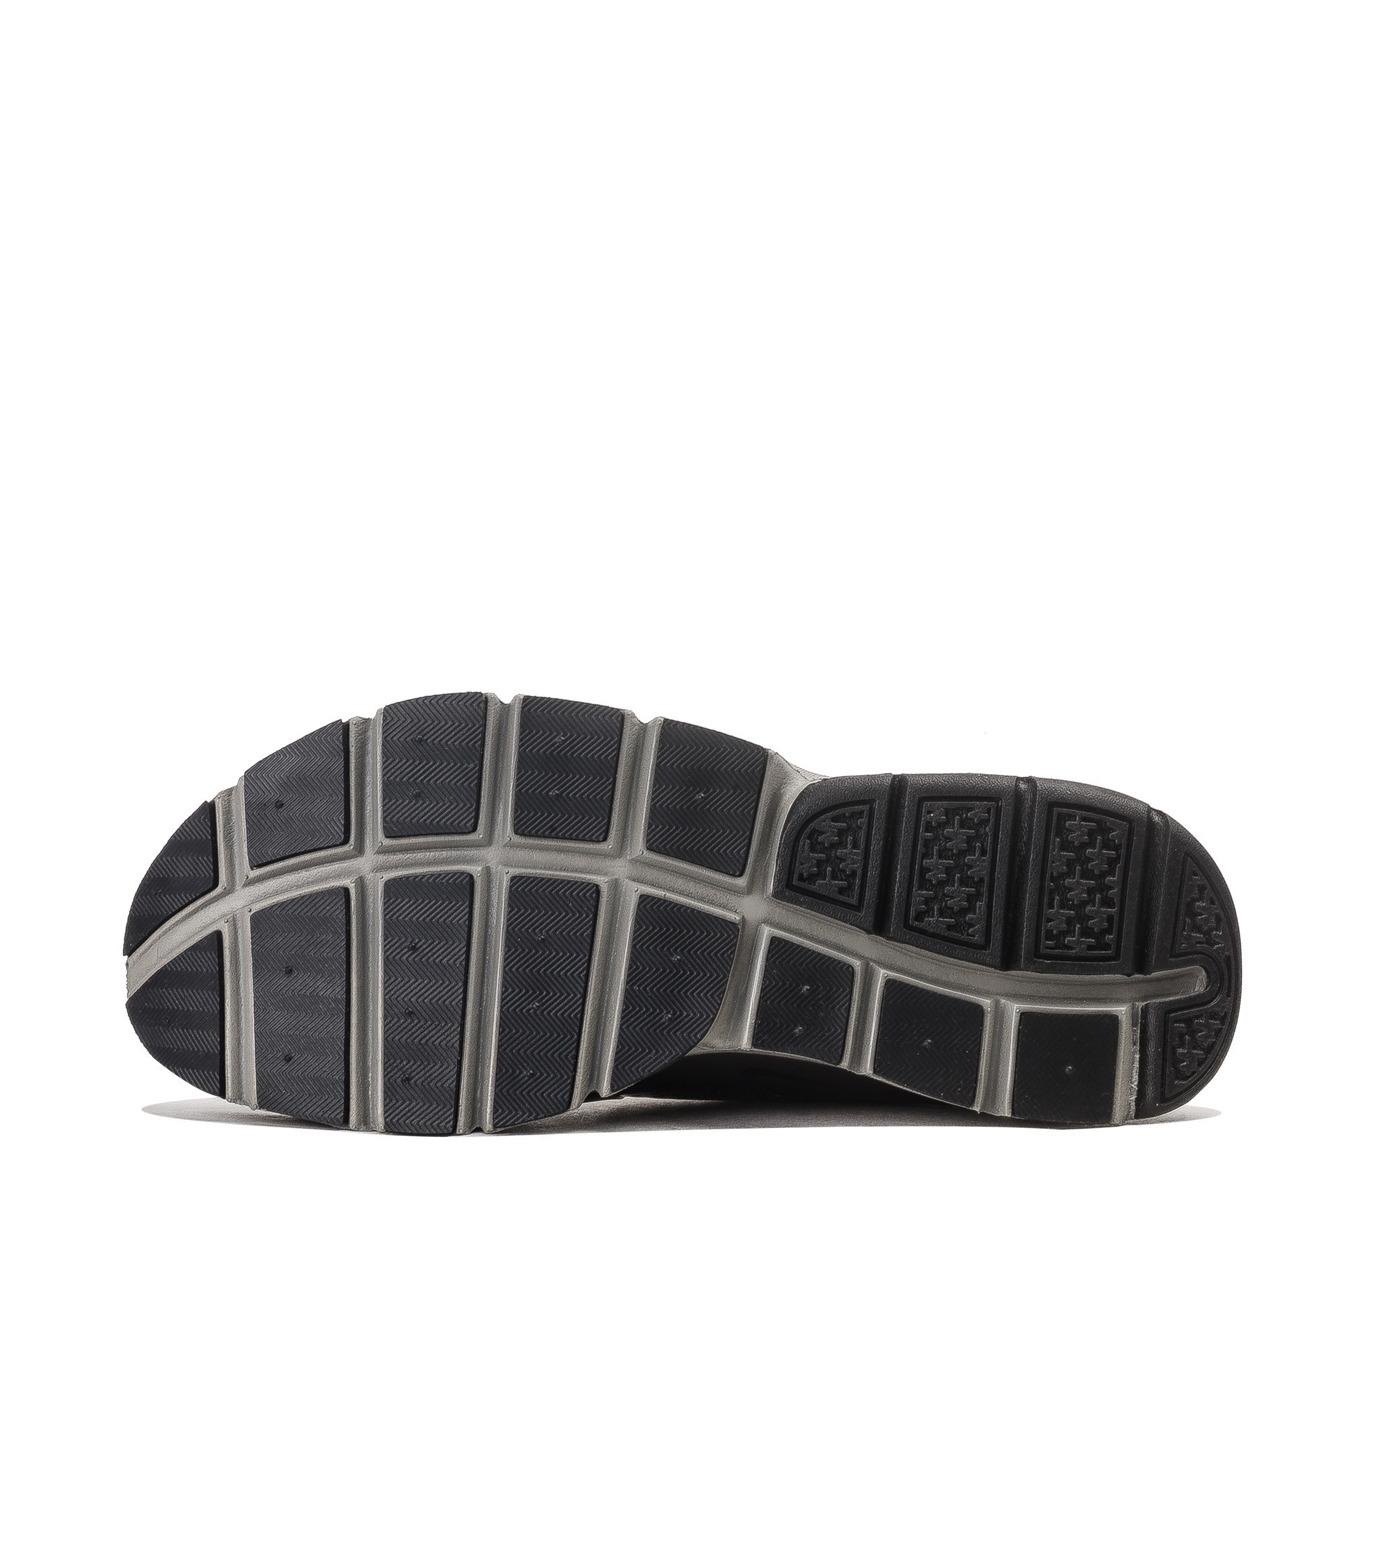 NIKE(ナイキ)のSOCK DART SE PRM-BLACK(シューズ/shoes)-859553-001-13 拡大詳細画像2